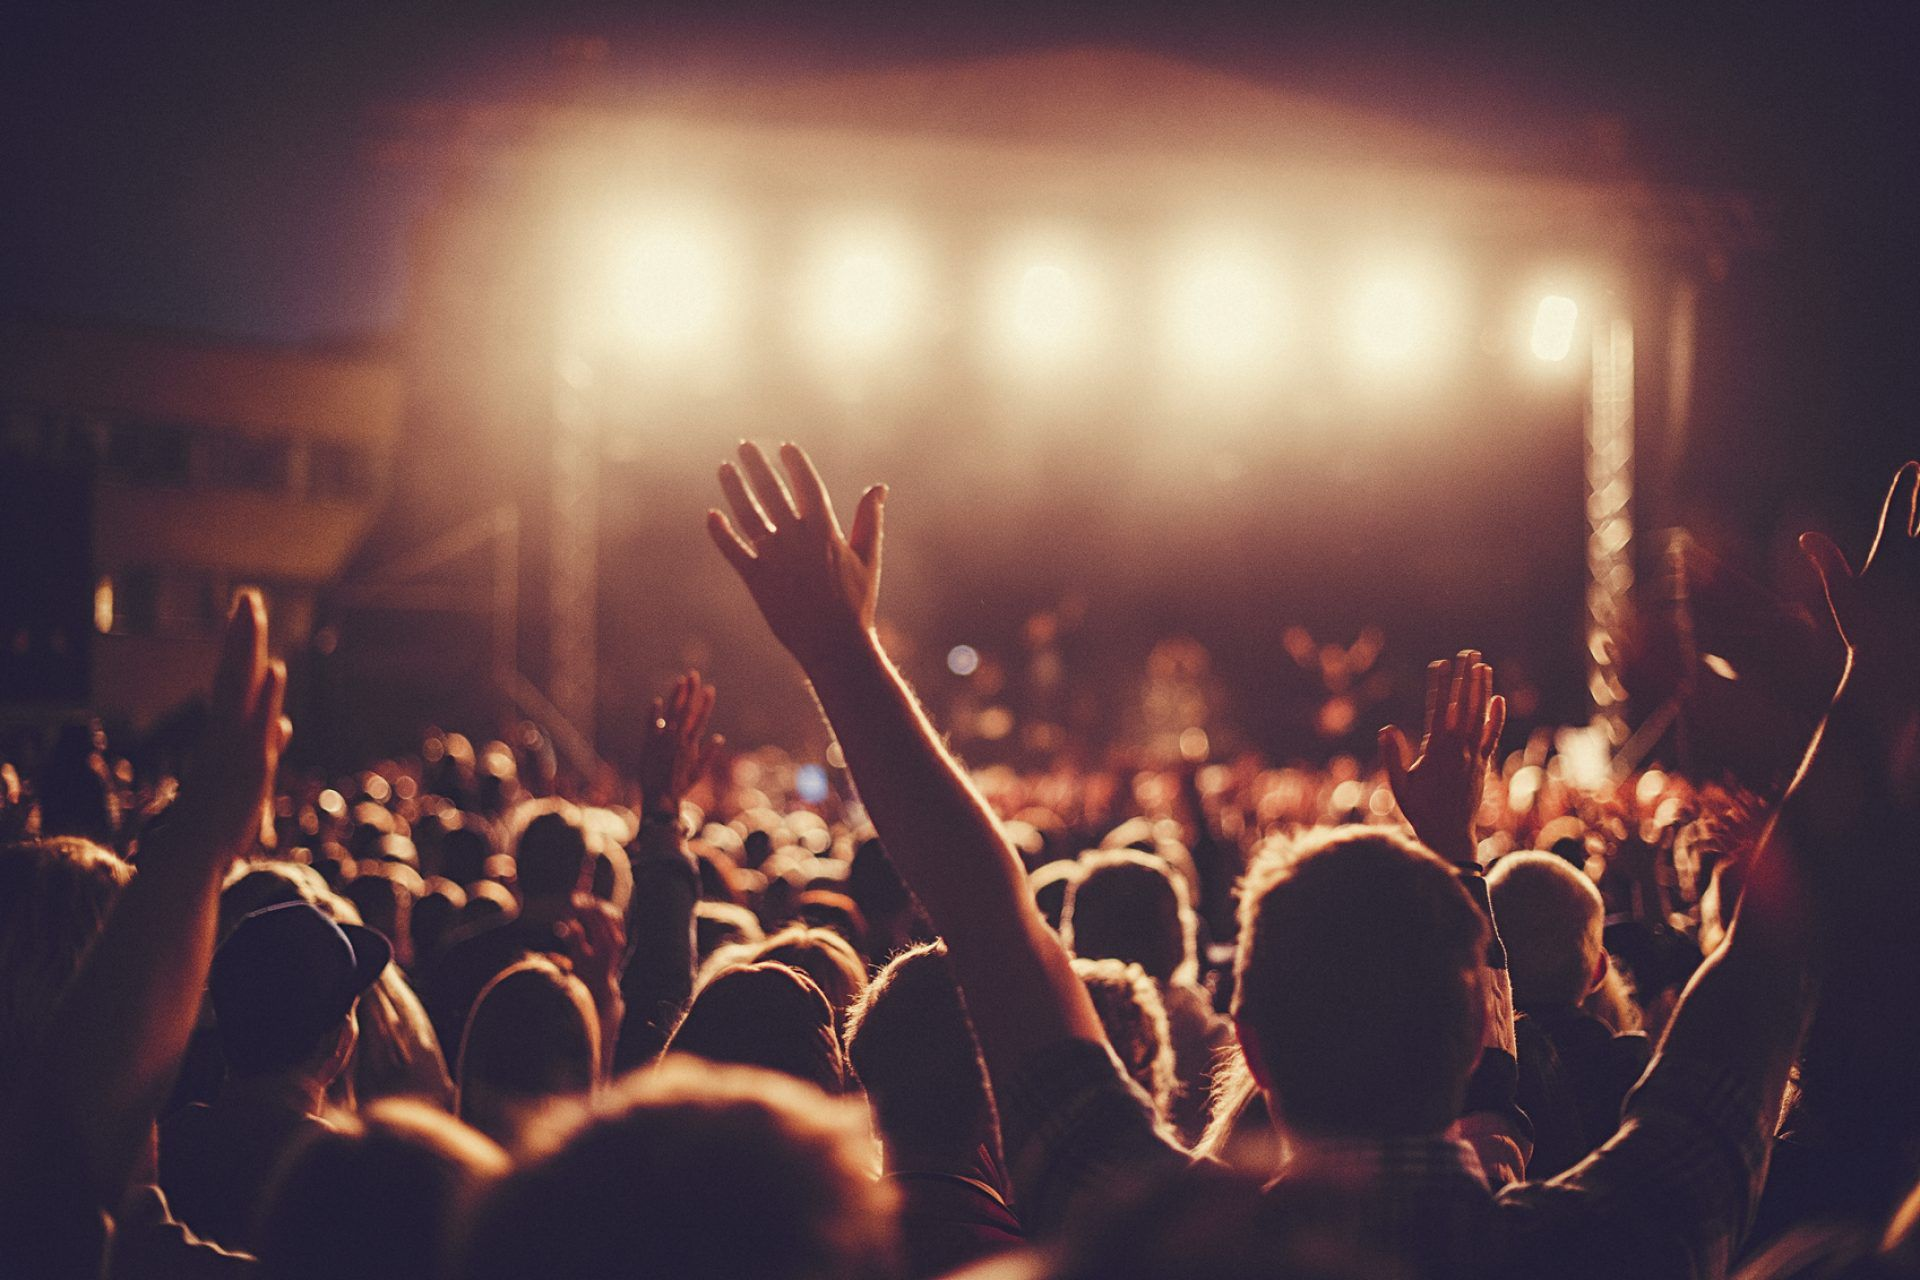 Iniciativa '24 horas de cultura a 6%' triplicou compra de bilhetes para espectáculos